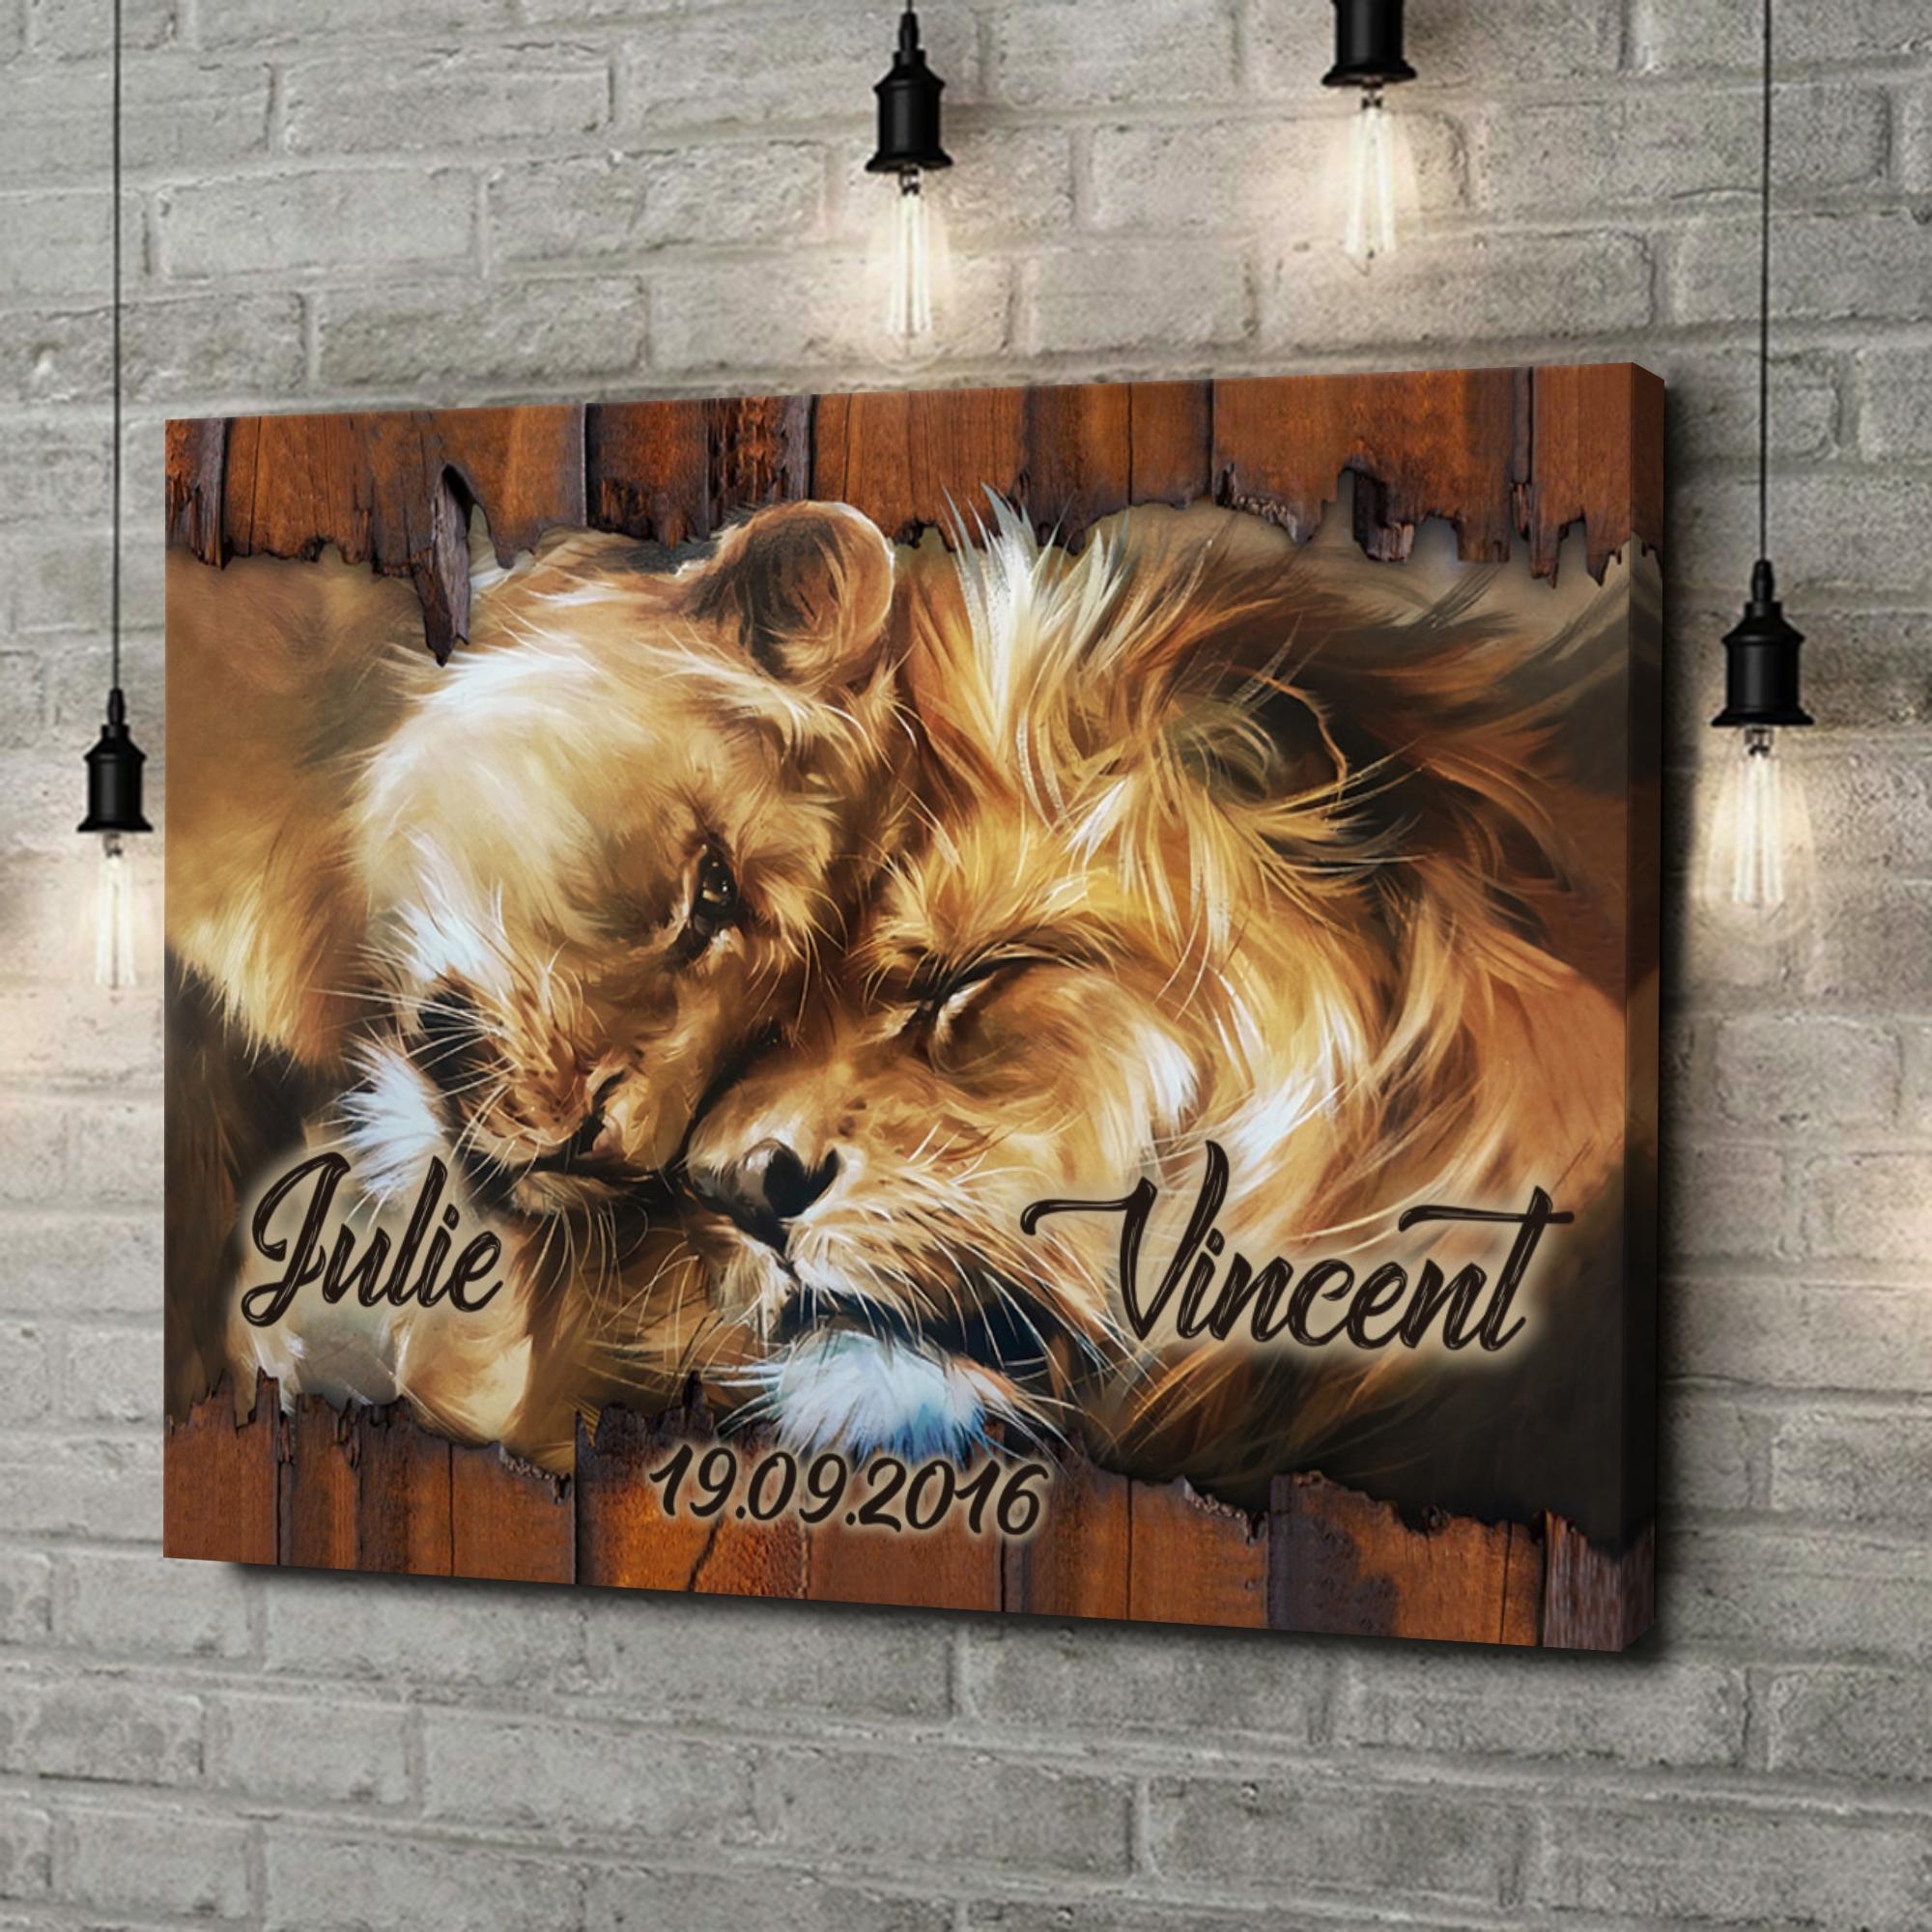 Leinwandbild personalisiert Löwenherz